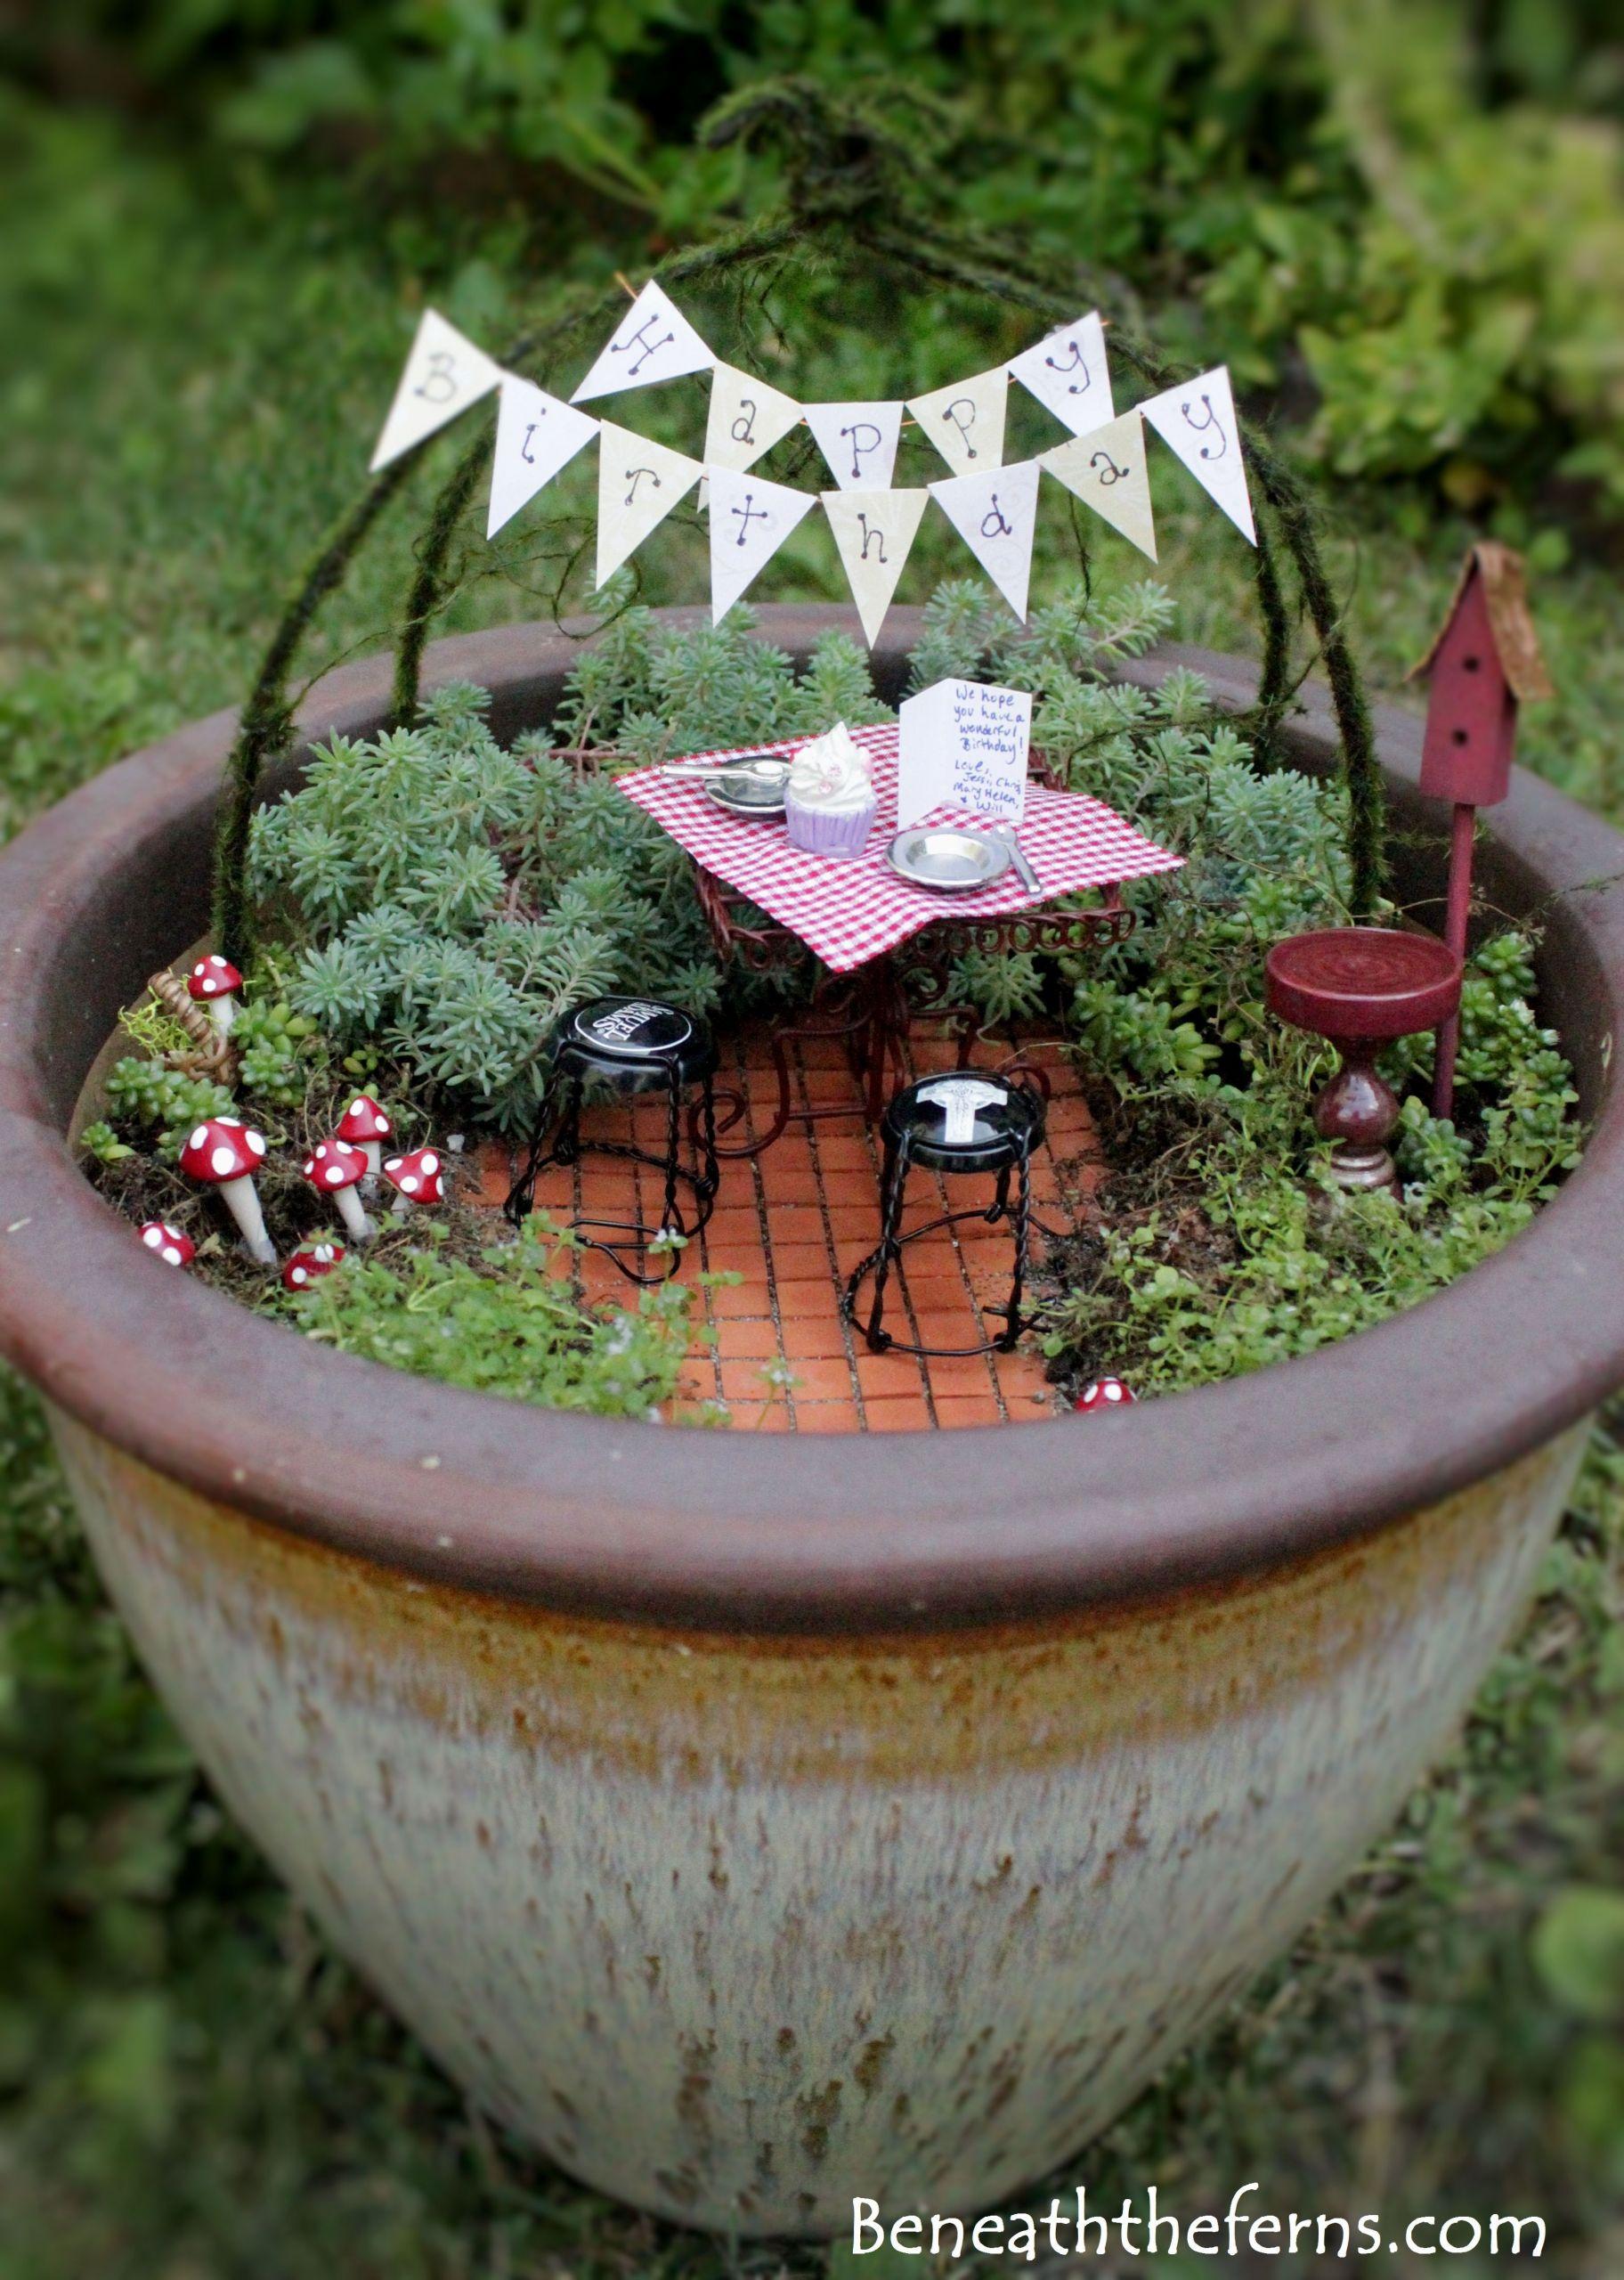 Miniatur Garten Selber Machen Schön Resultado De Imagen Para Fairy Garden